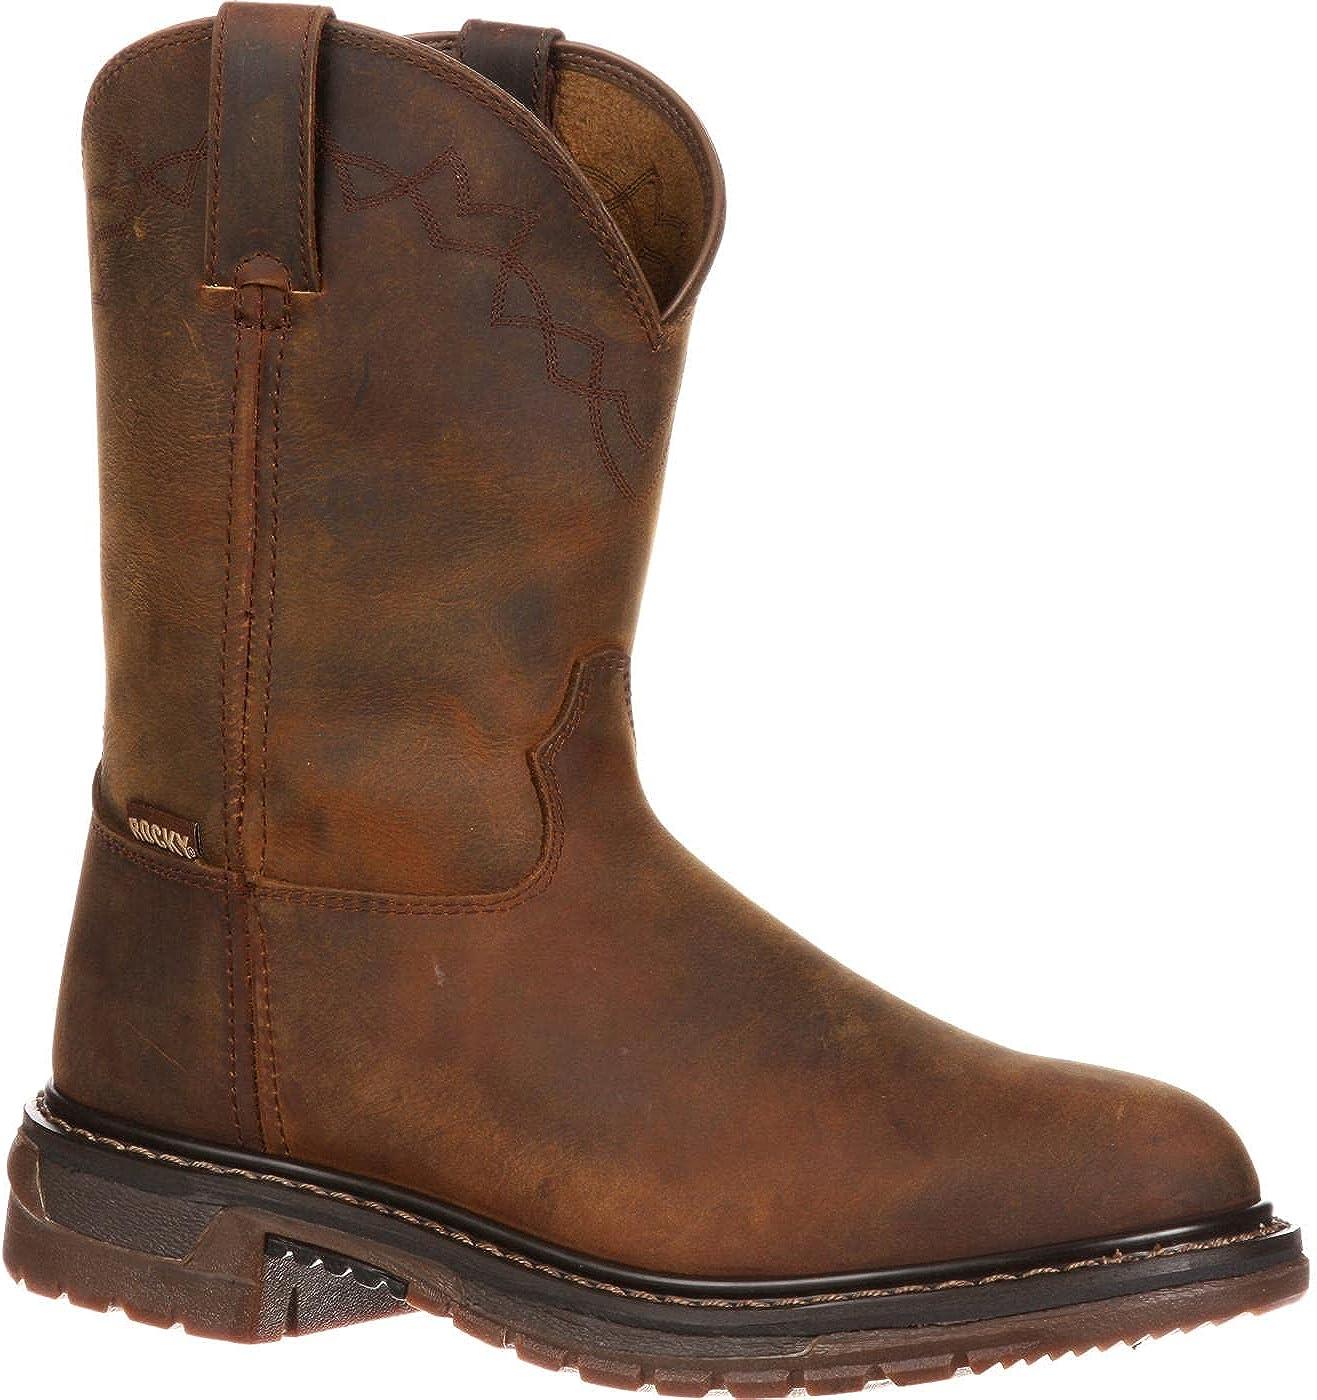 Rocky Original Ride Roper Western Boot Size 7.5(M)